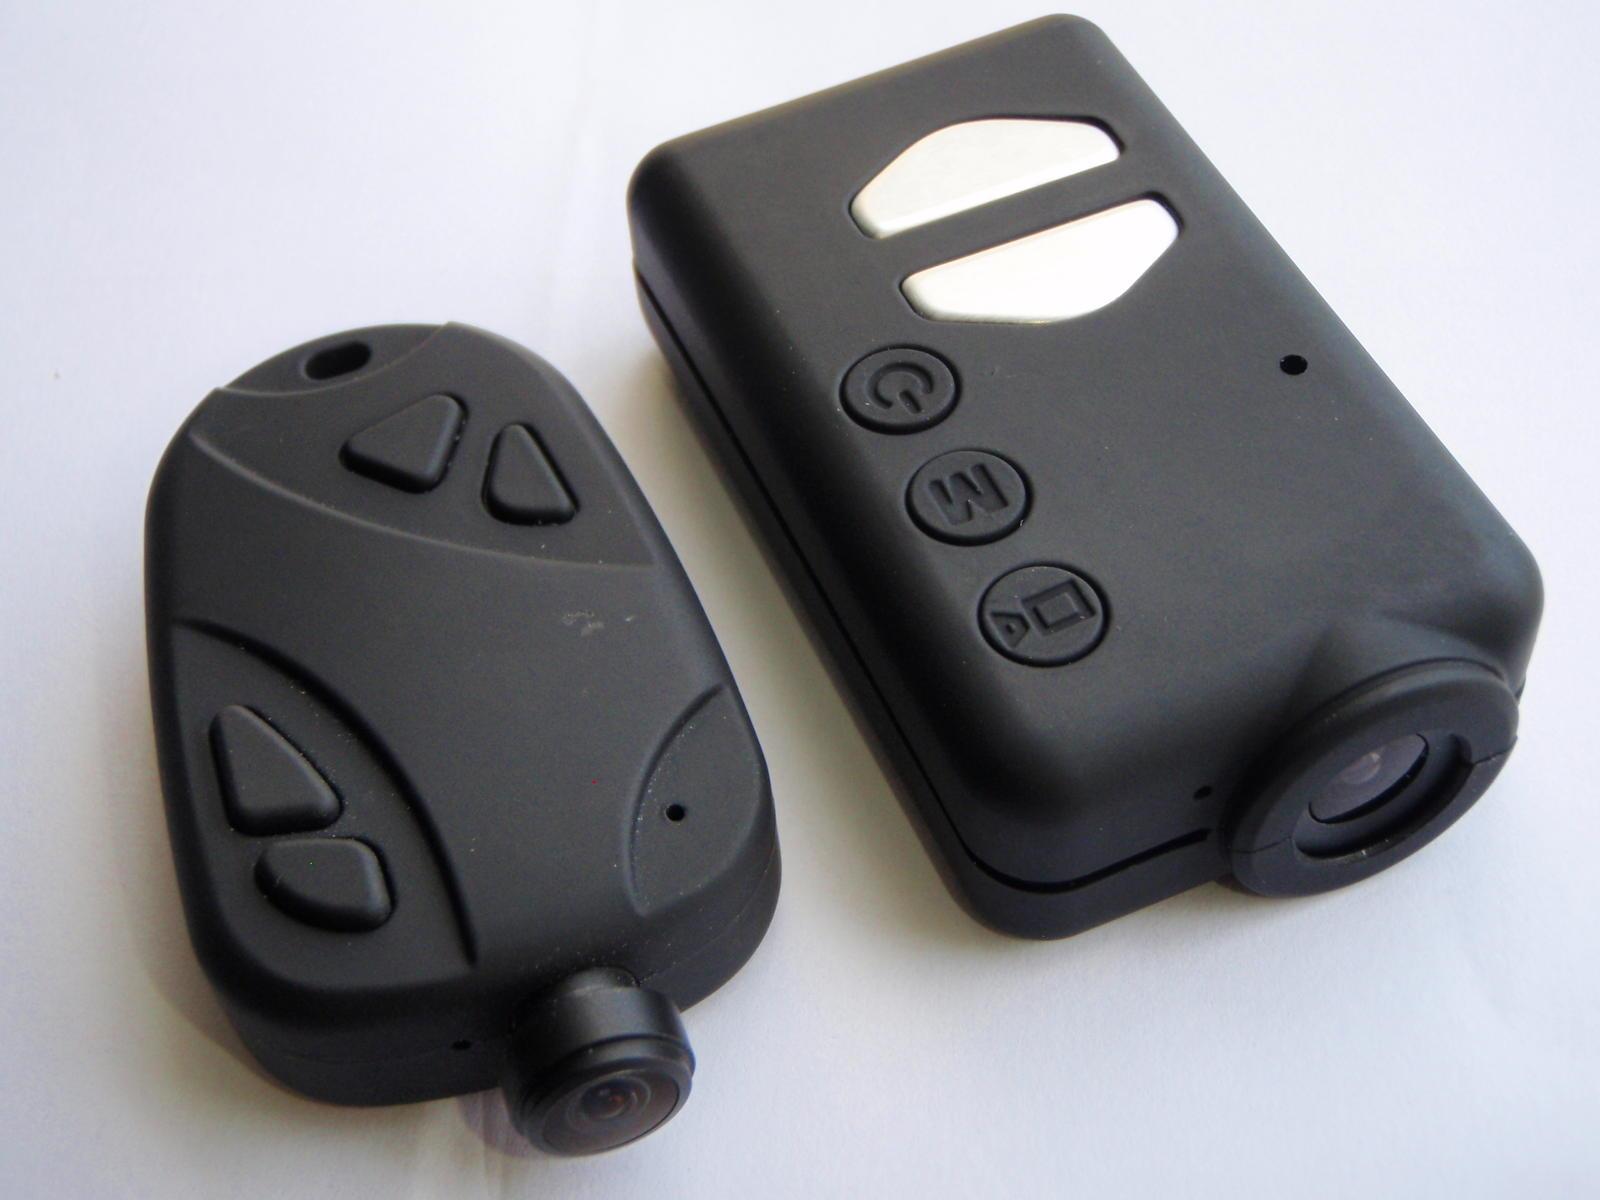 Thermostat Temperature Controlled Switch KSD301 BT T W3P4 2 Pcs 175 Celsius N.C